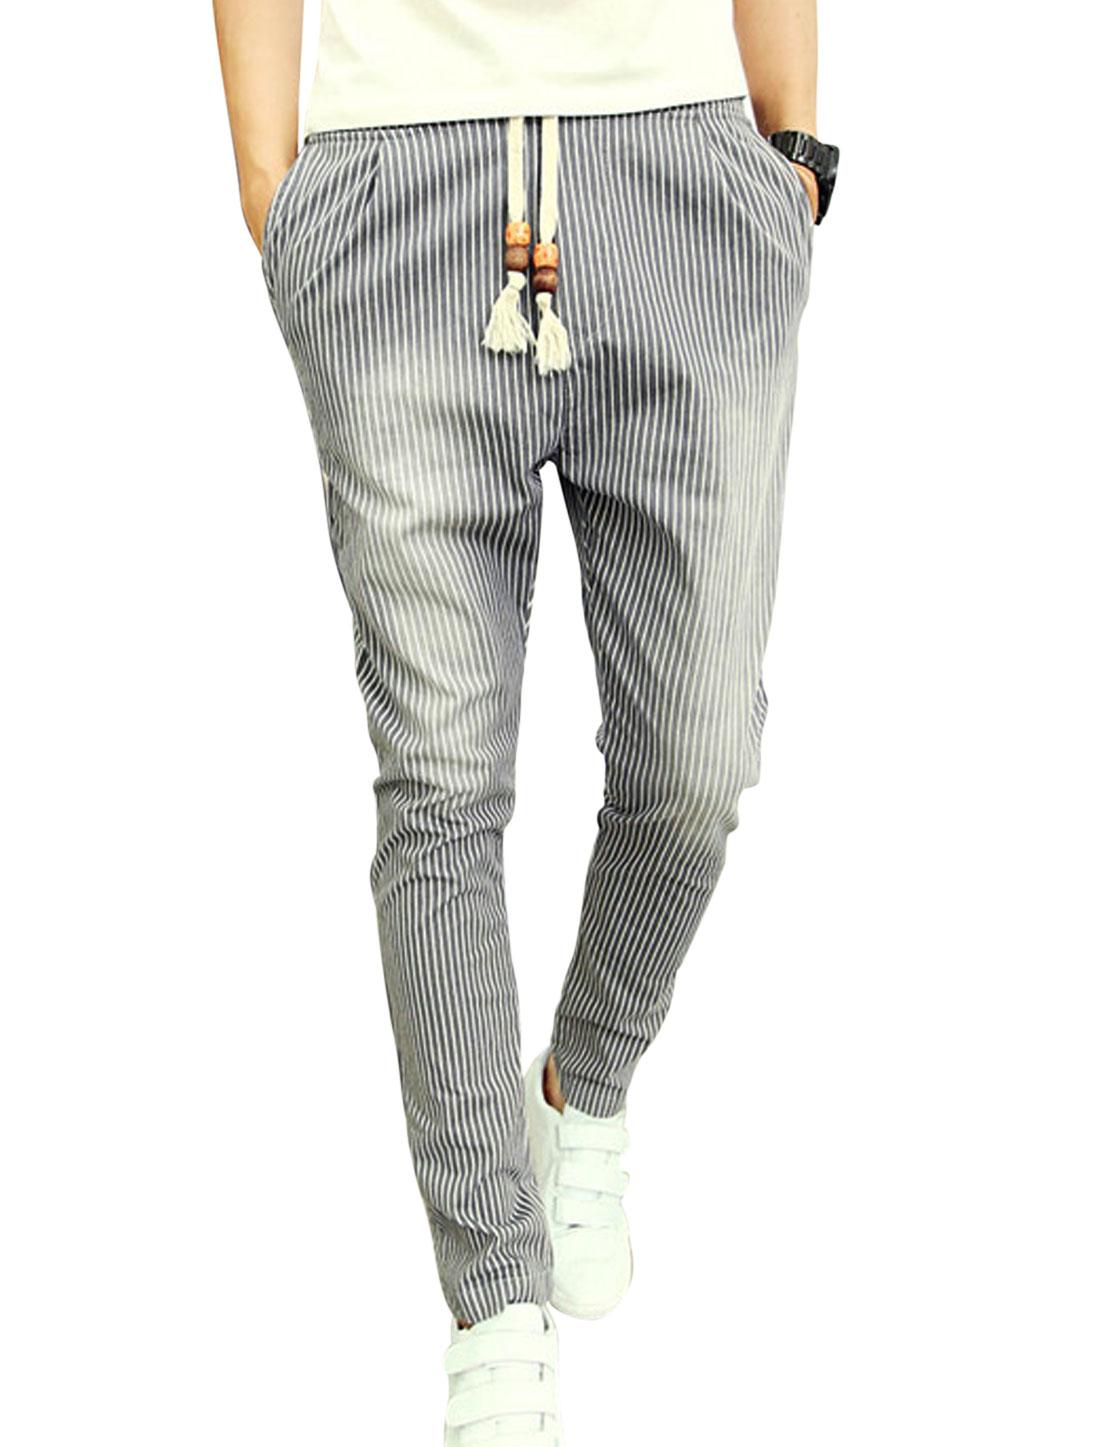 Man Vertical Stripes Button Closure Light Gray Casual Pants W30